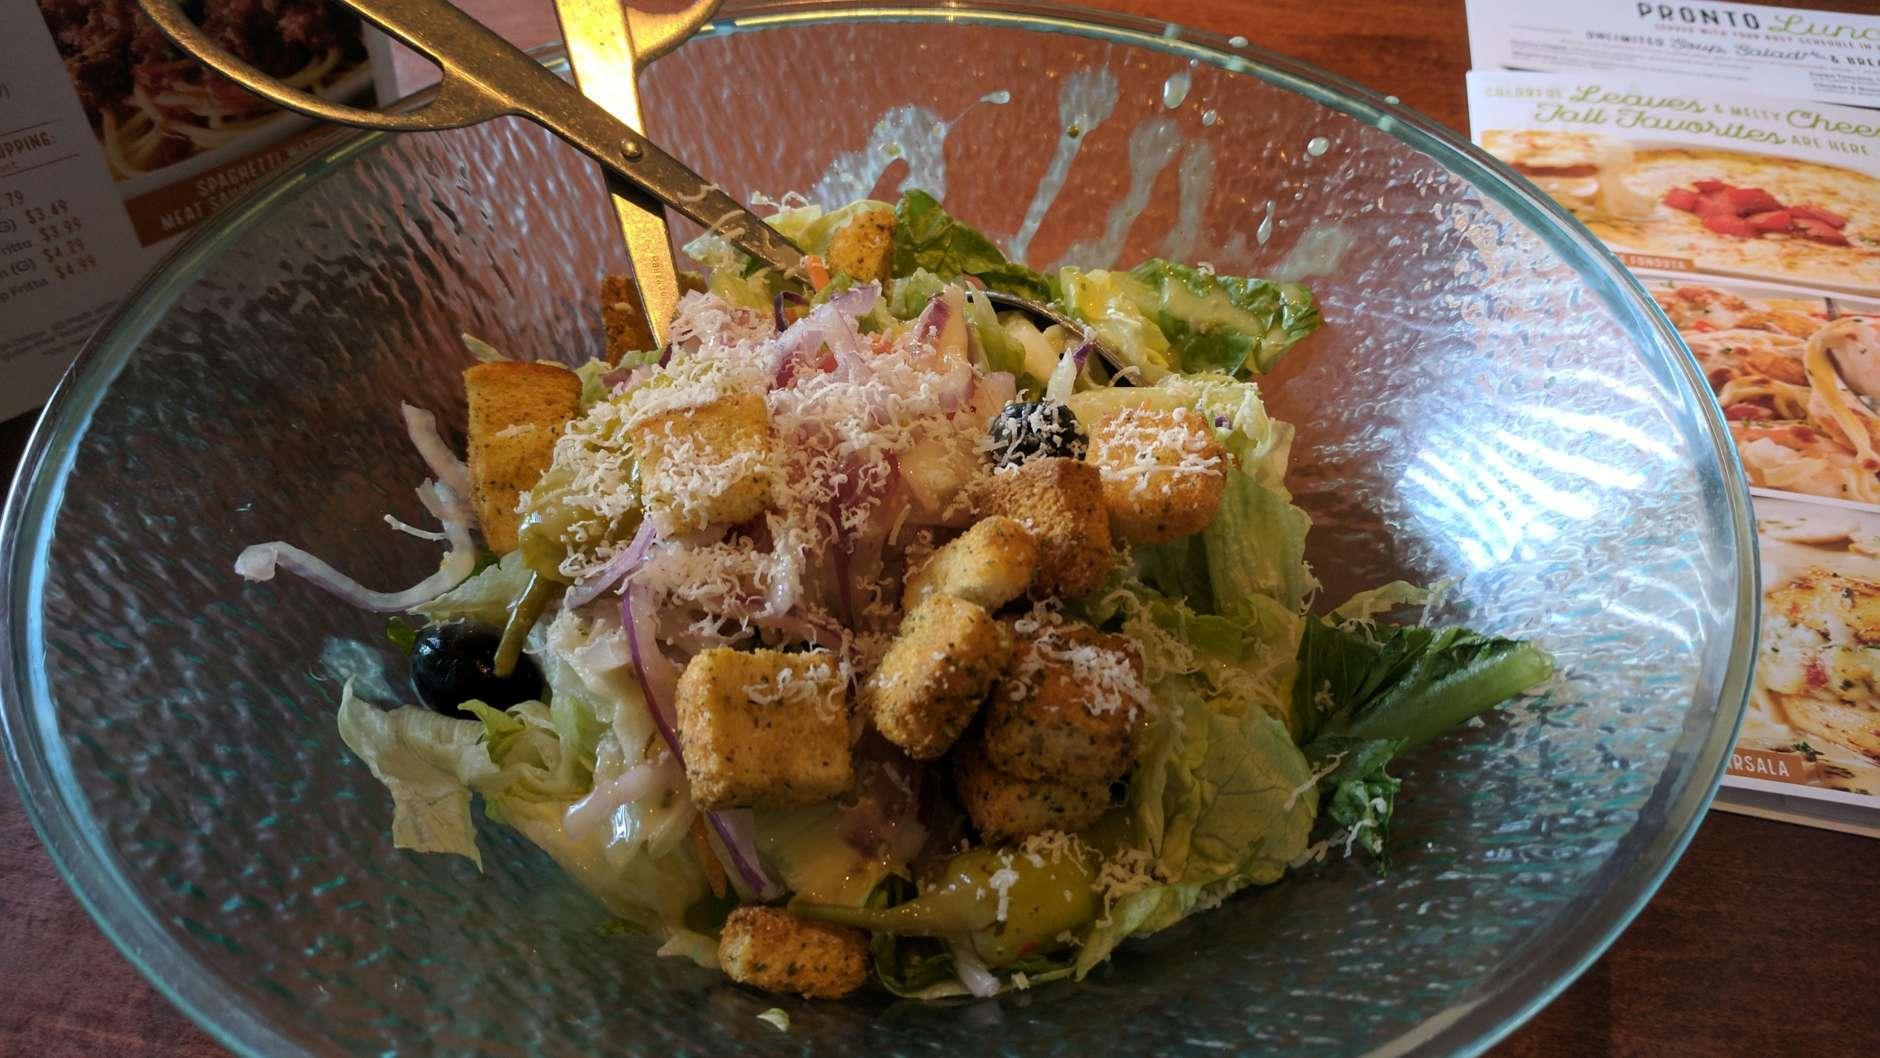 A salad at the Falls Church Olive Garden. (WTOP/Brandon Millman)